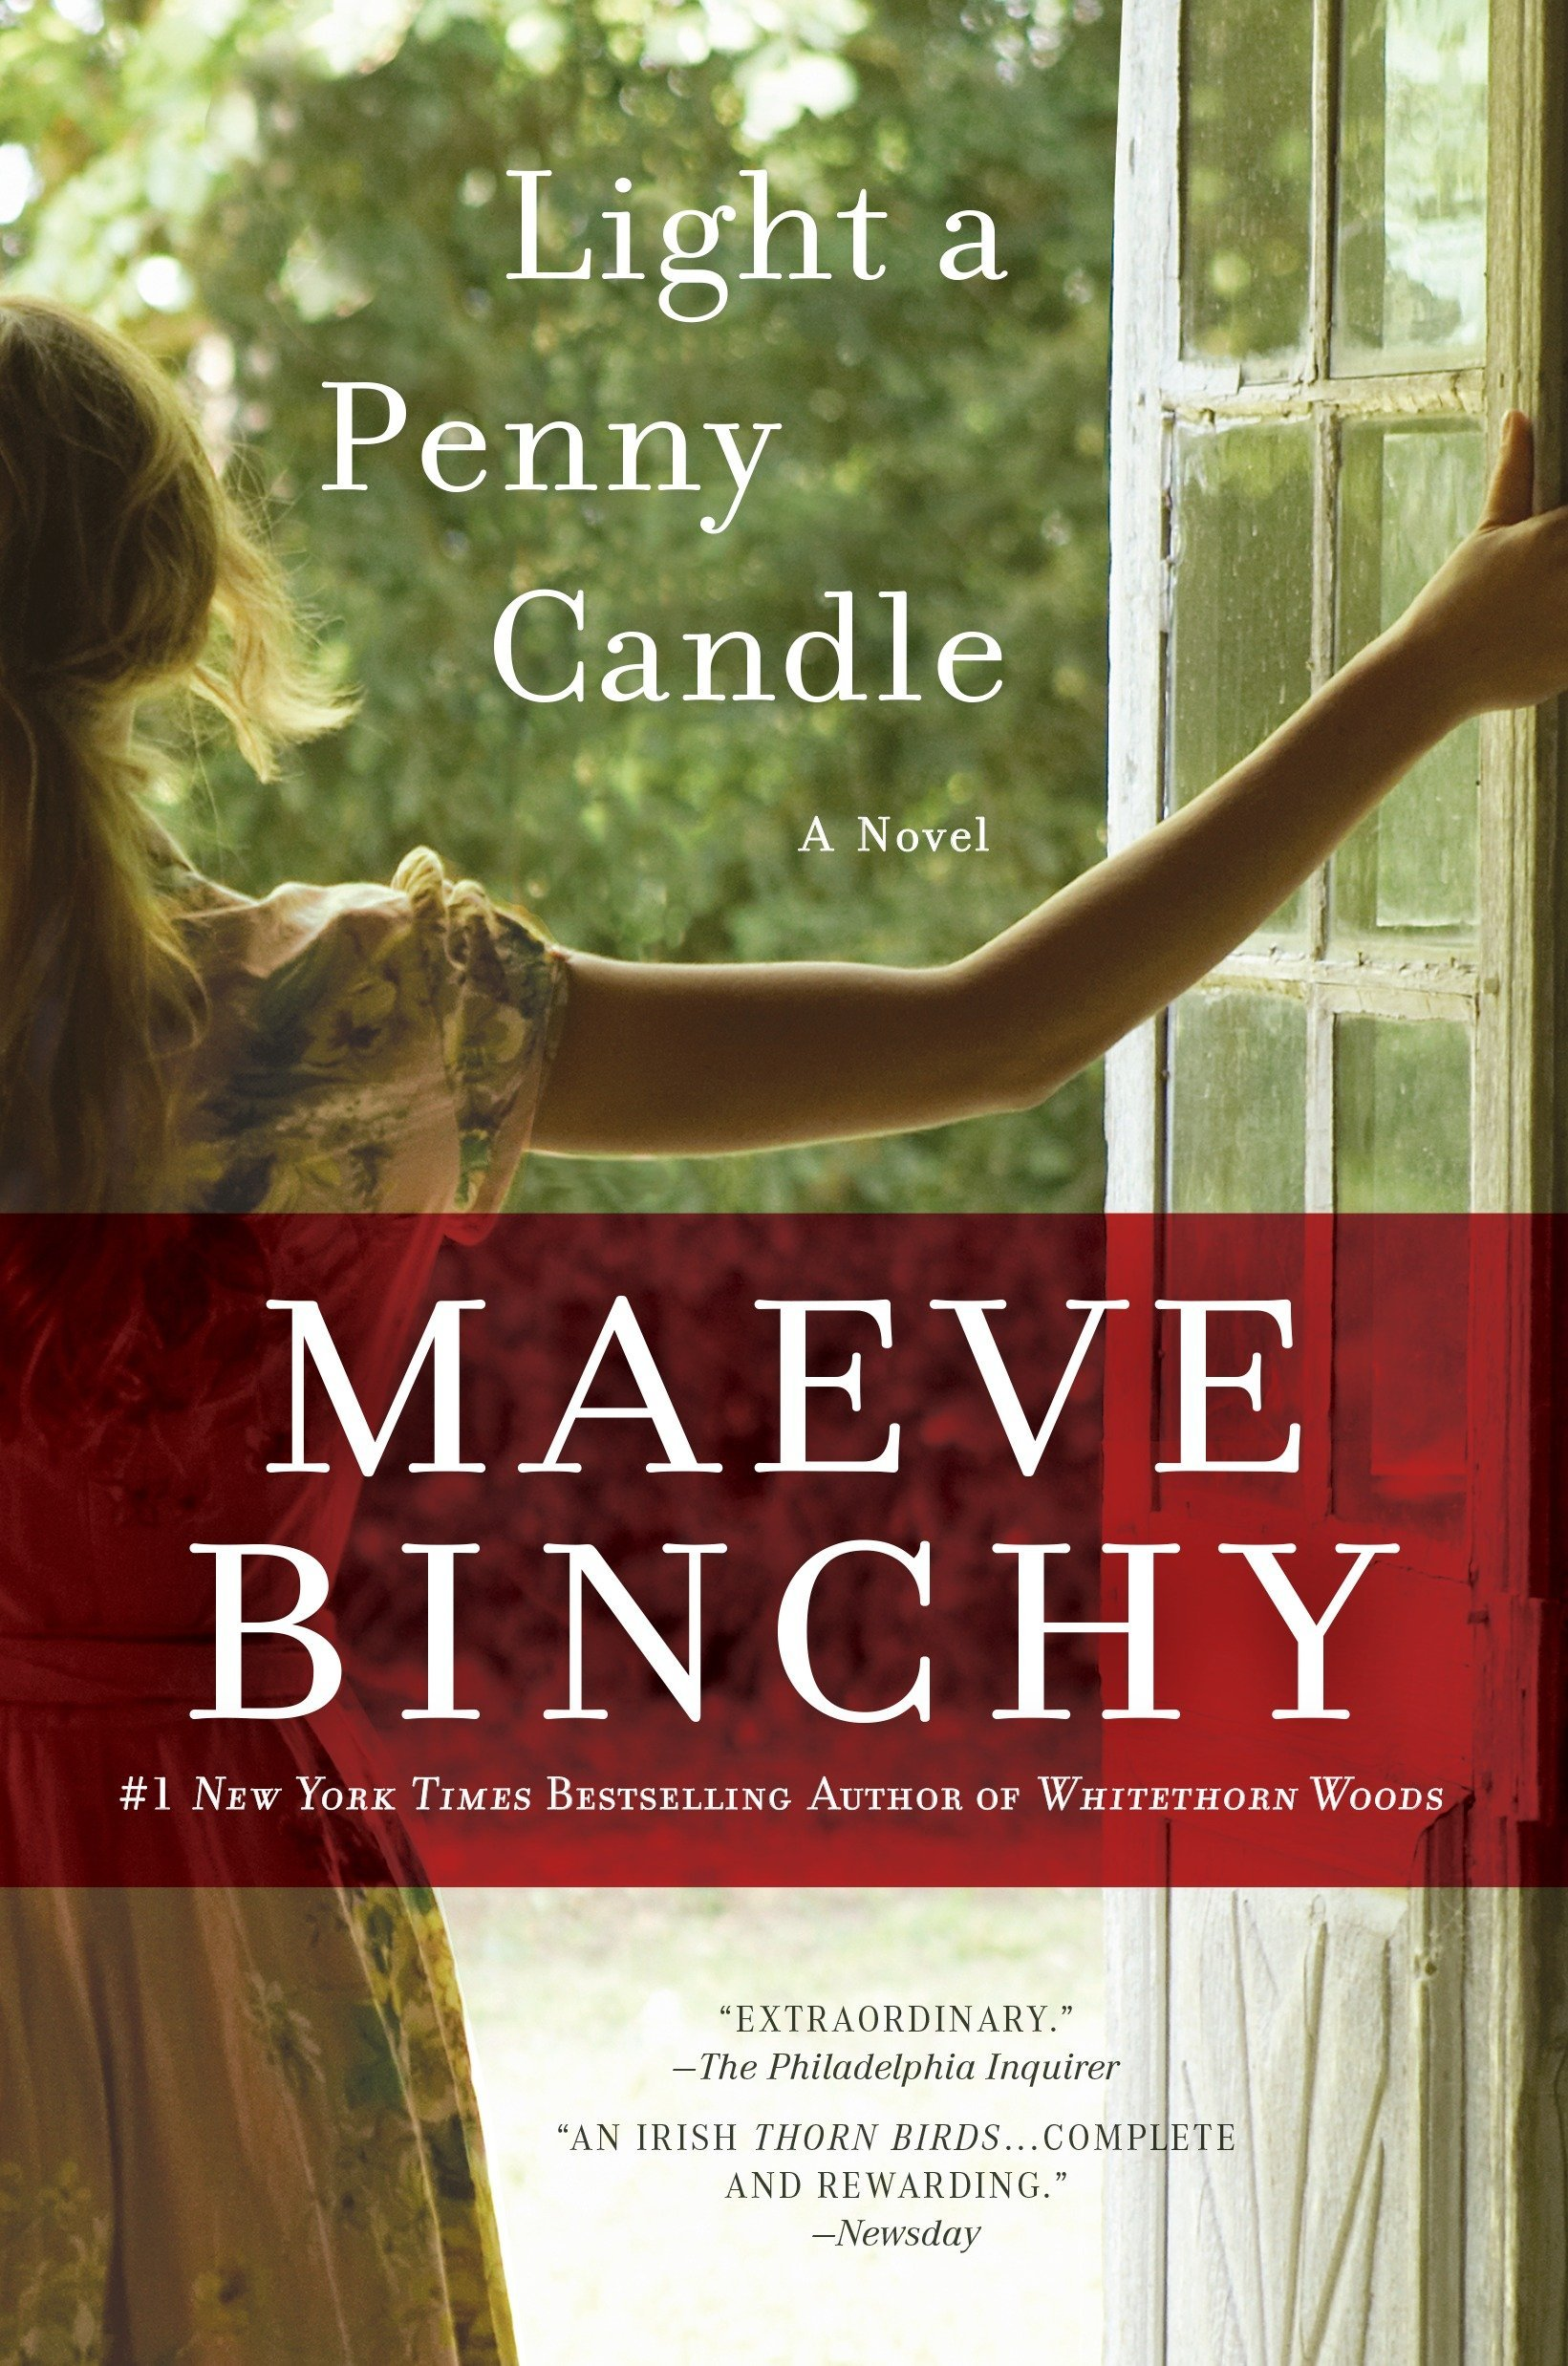 MAEVE BINCHY LIGHT A PENNY CANDLE PDF